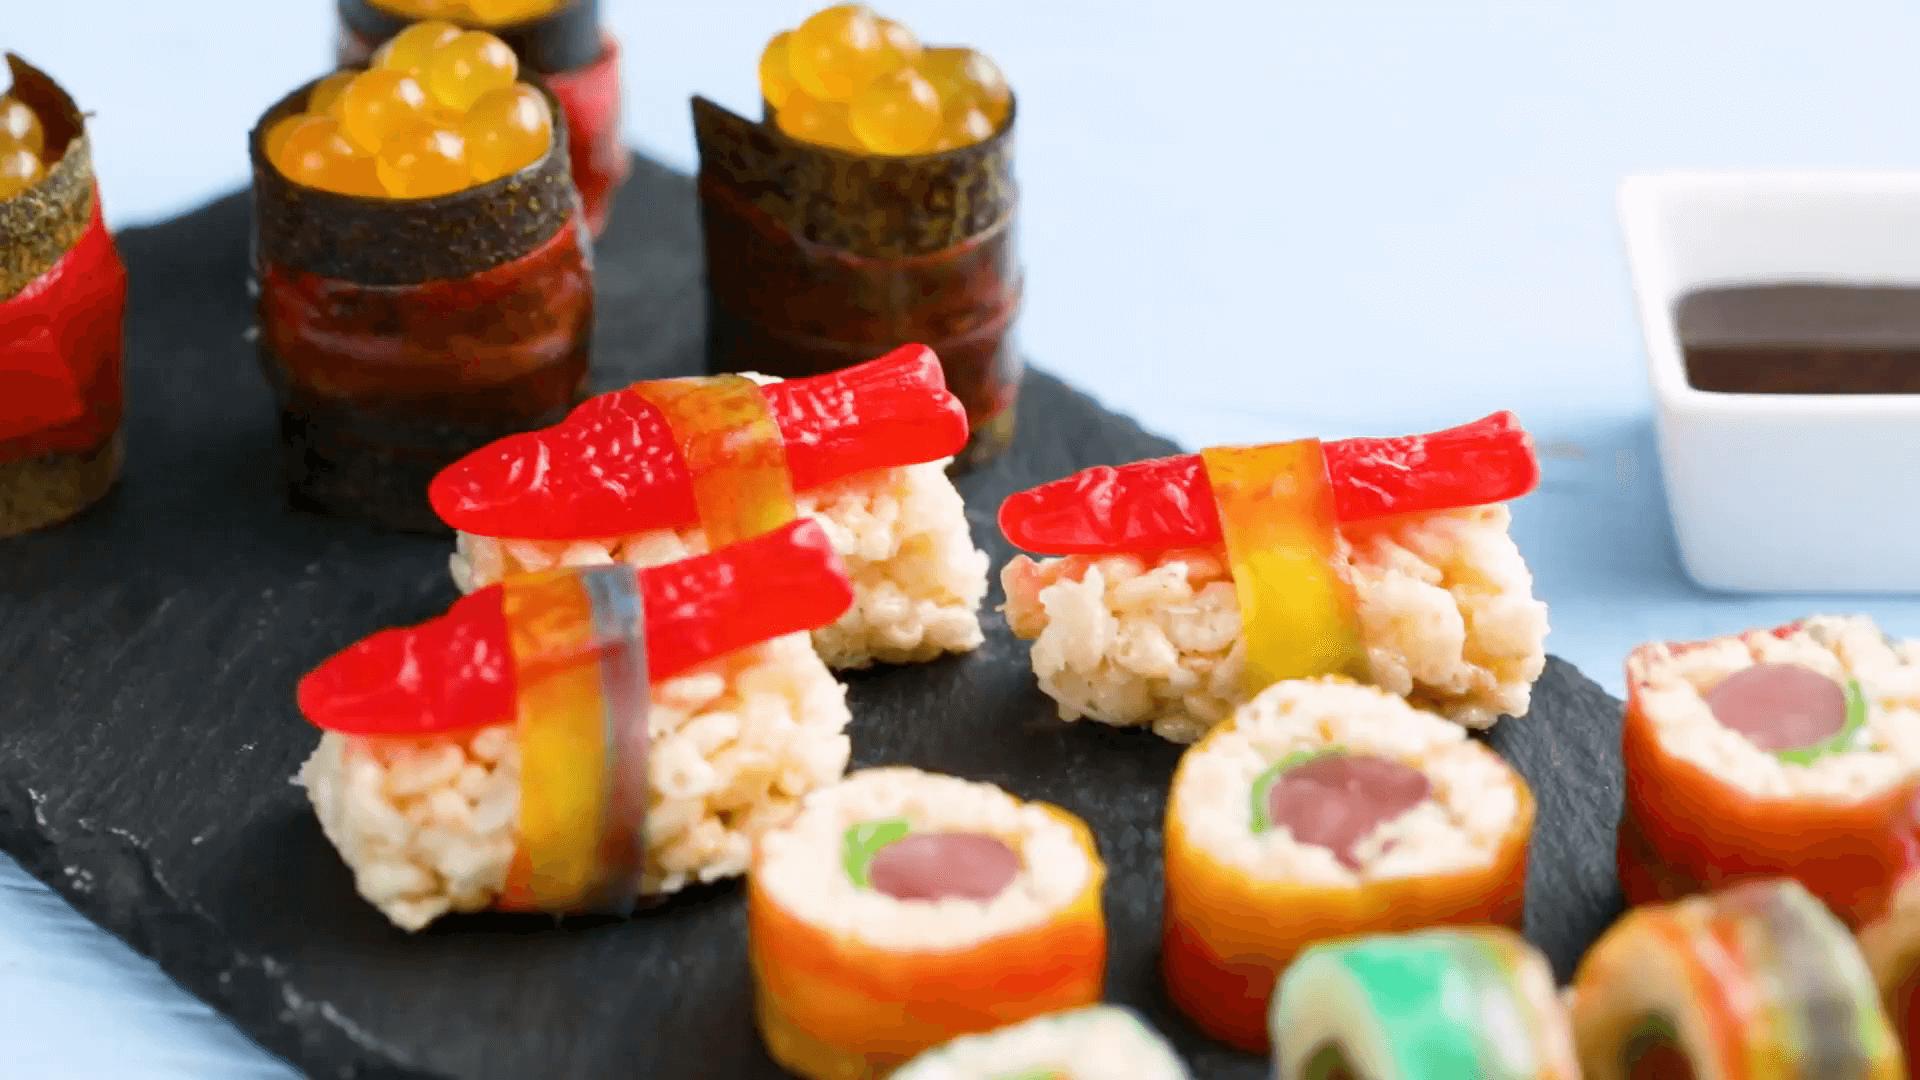 sushi food desktop wallpaper 66889